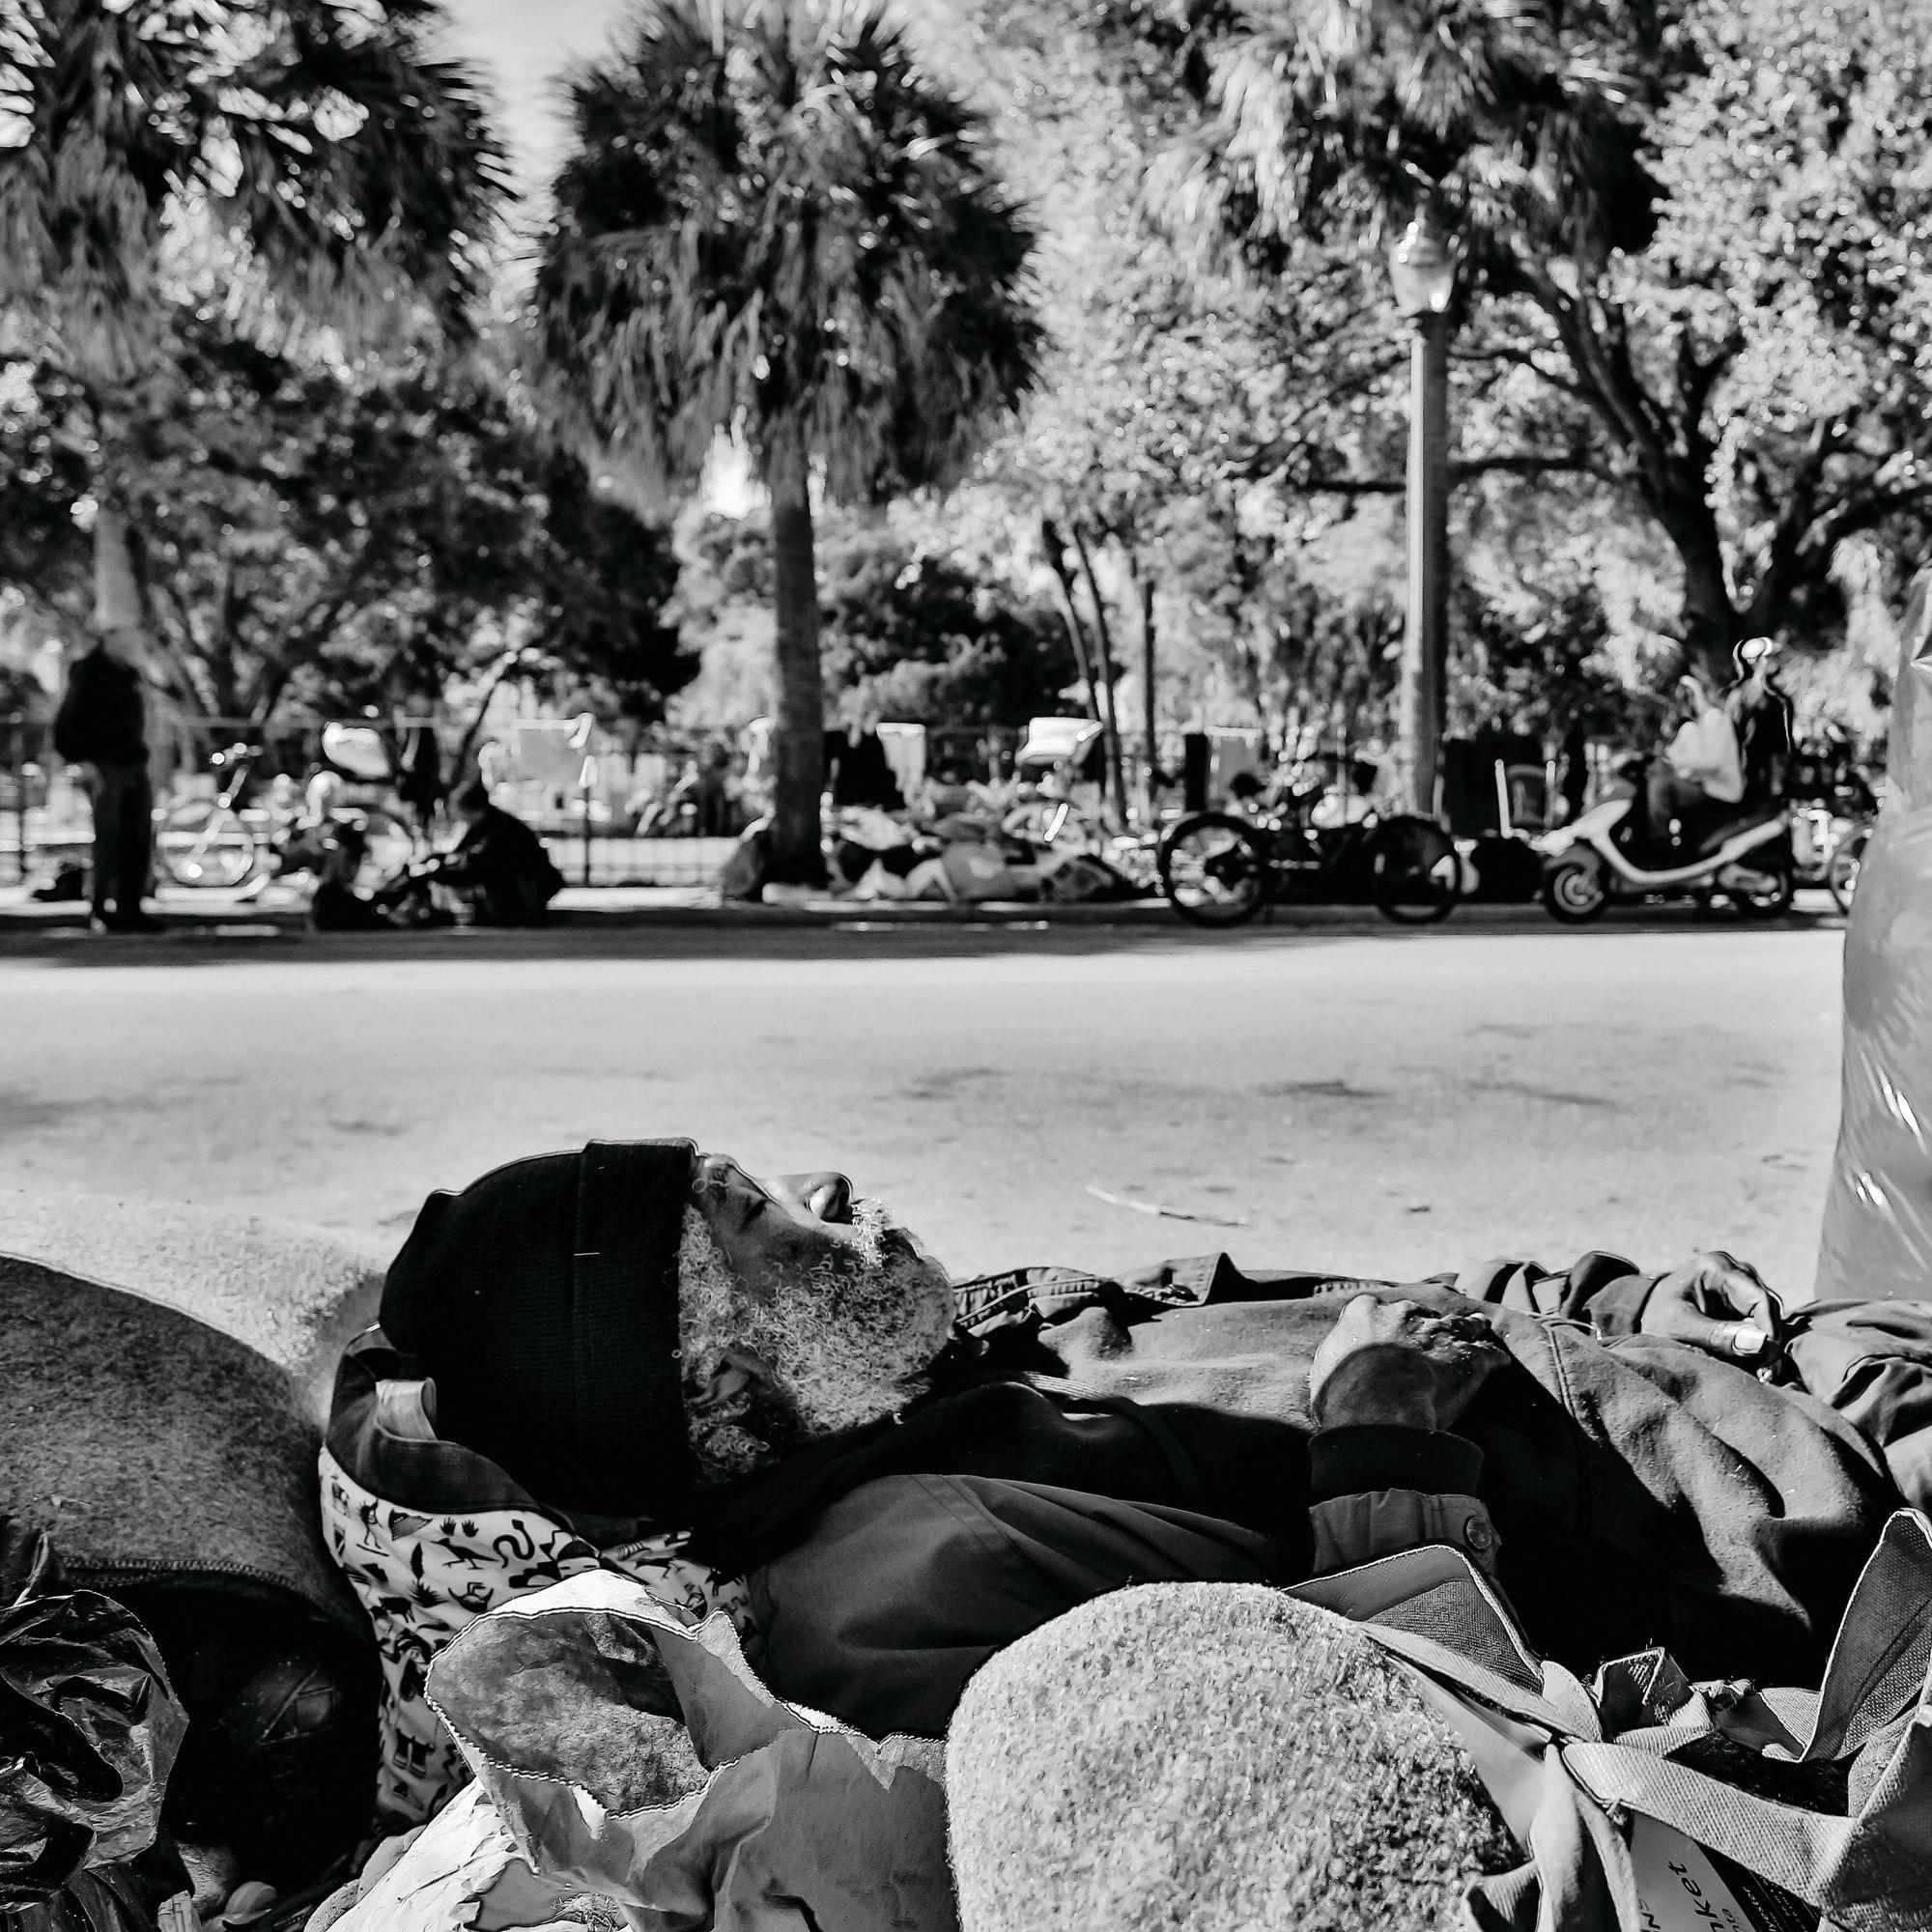 Homeless noqysv